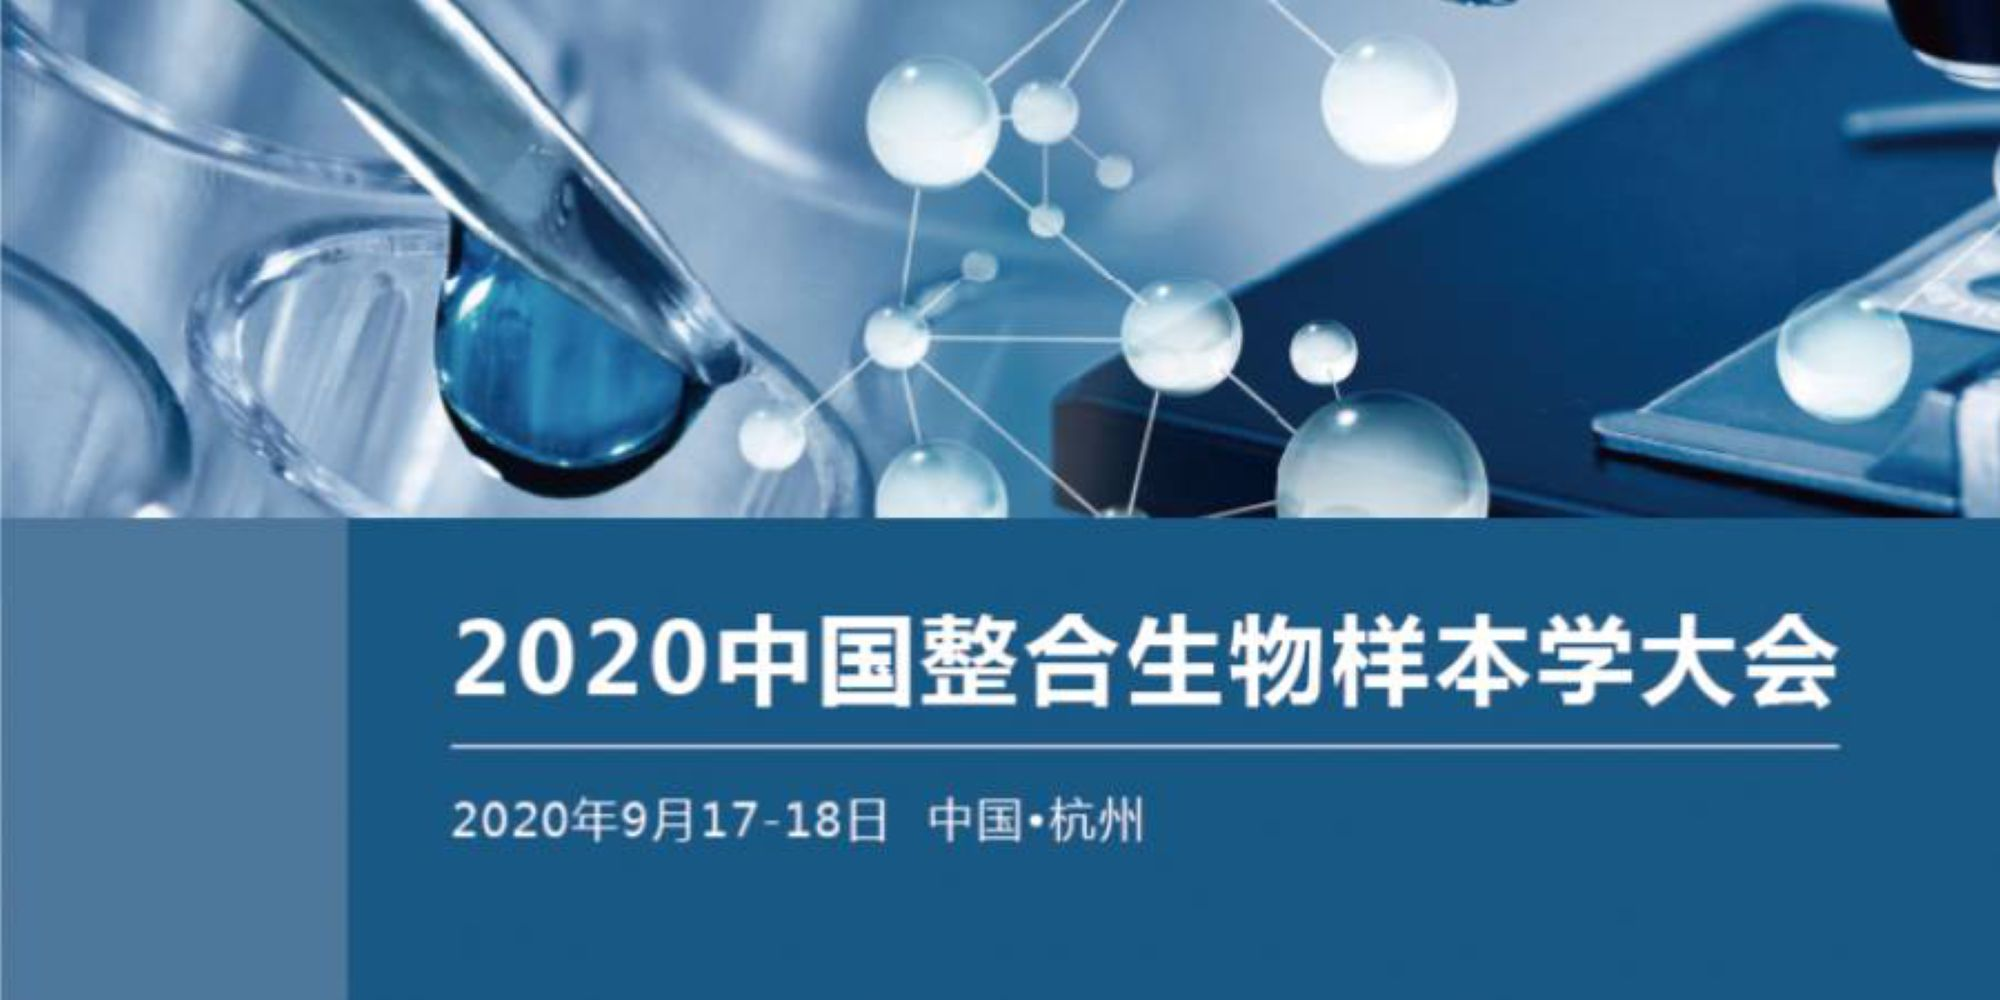 CN_20200924_Pharma_tradeshow_01.jpg